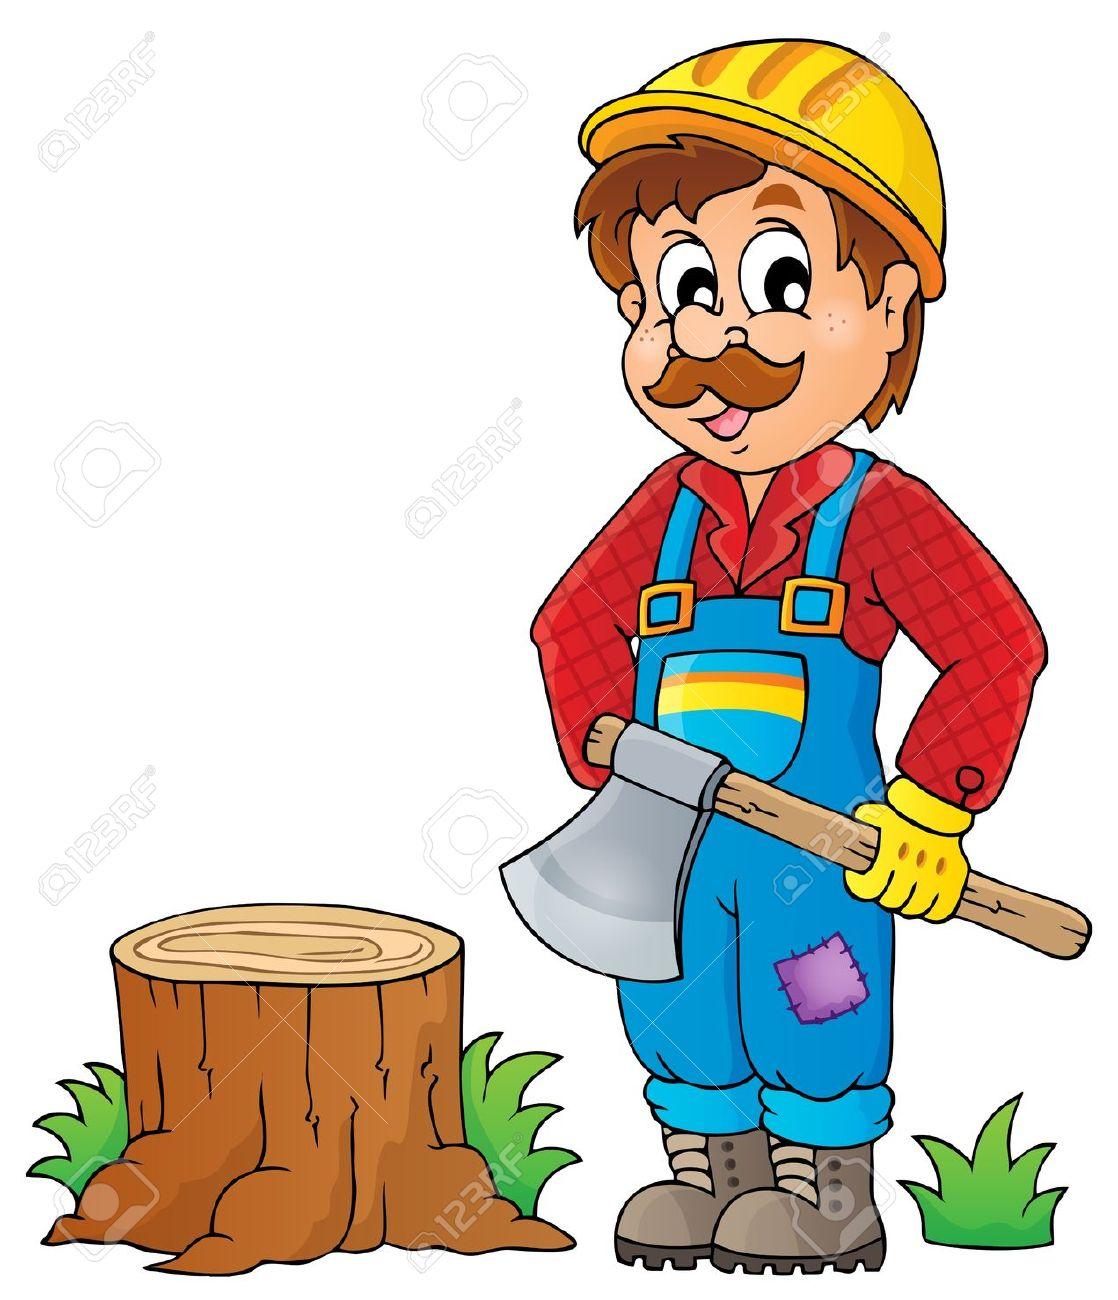 Woodcutter clipart.